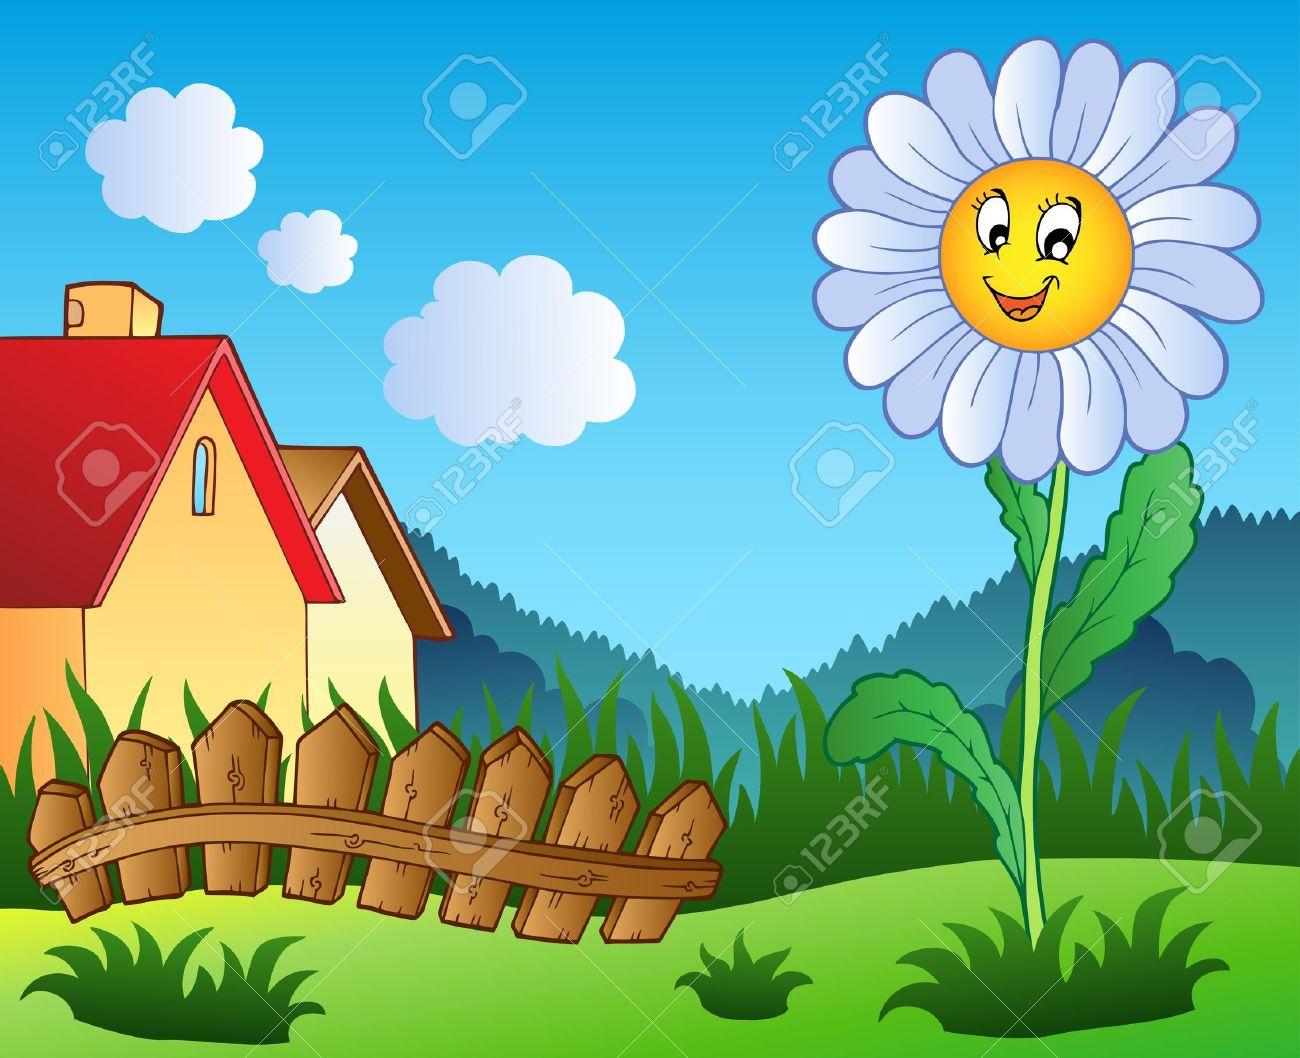 Meadow with daisy - vector illustration. Stock Vector - 9674307